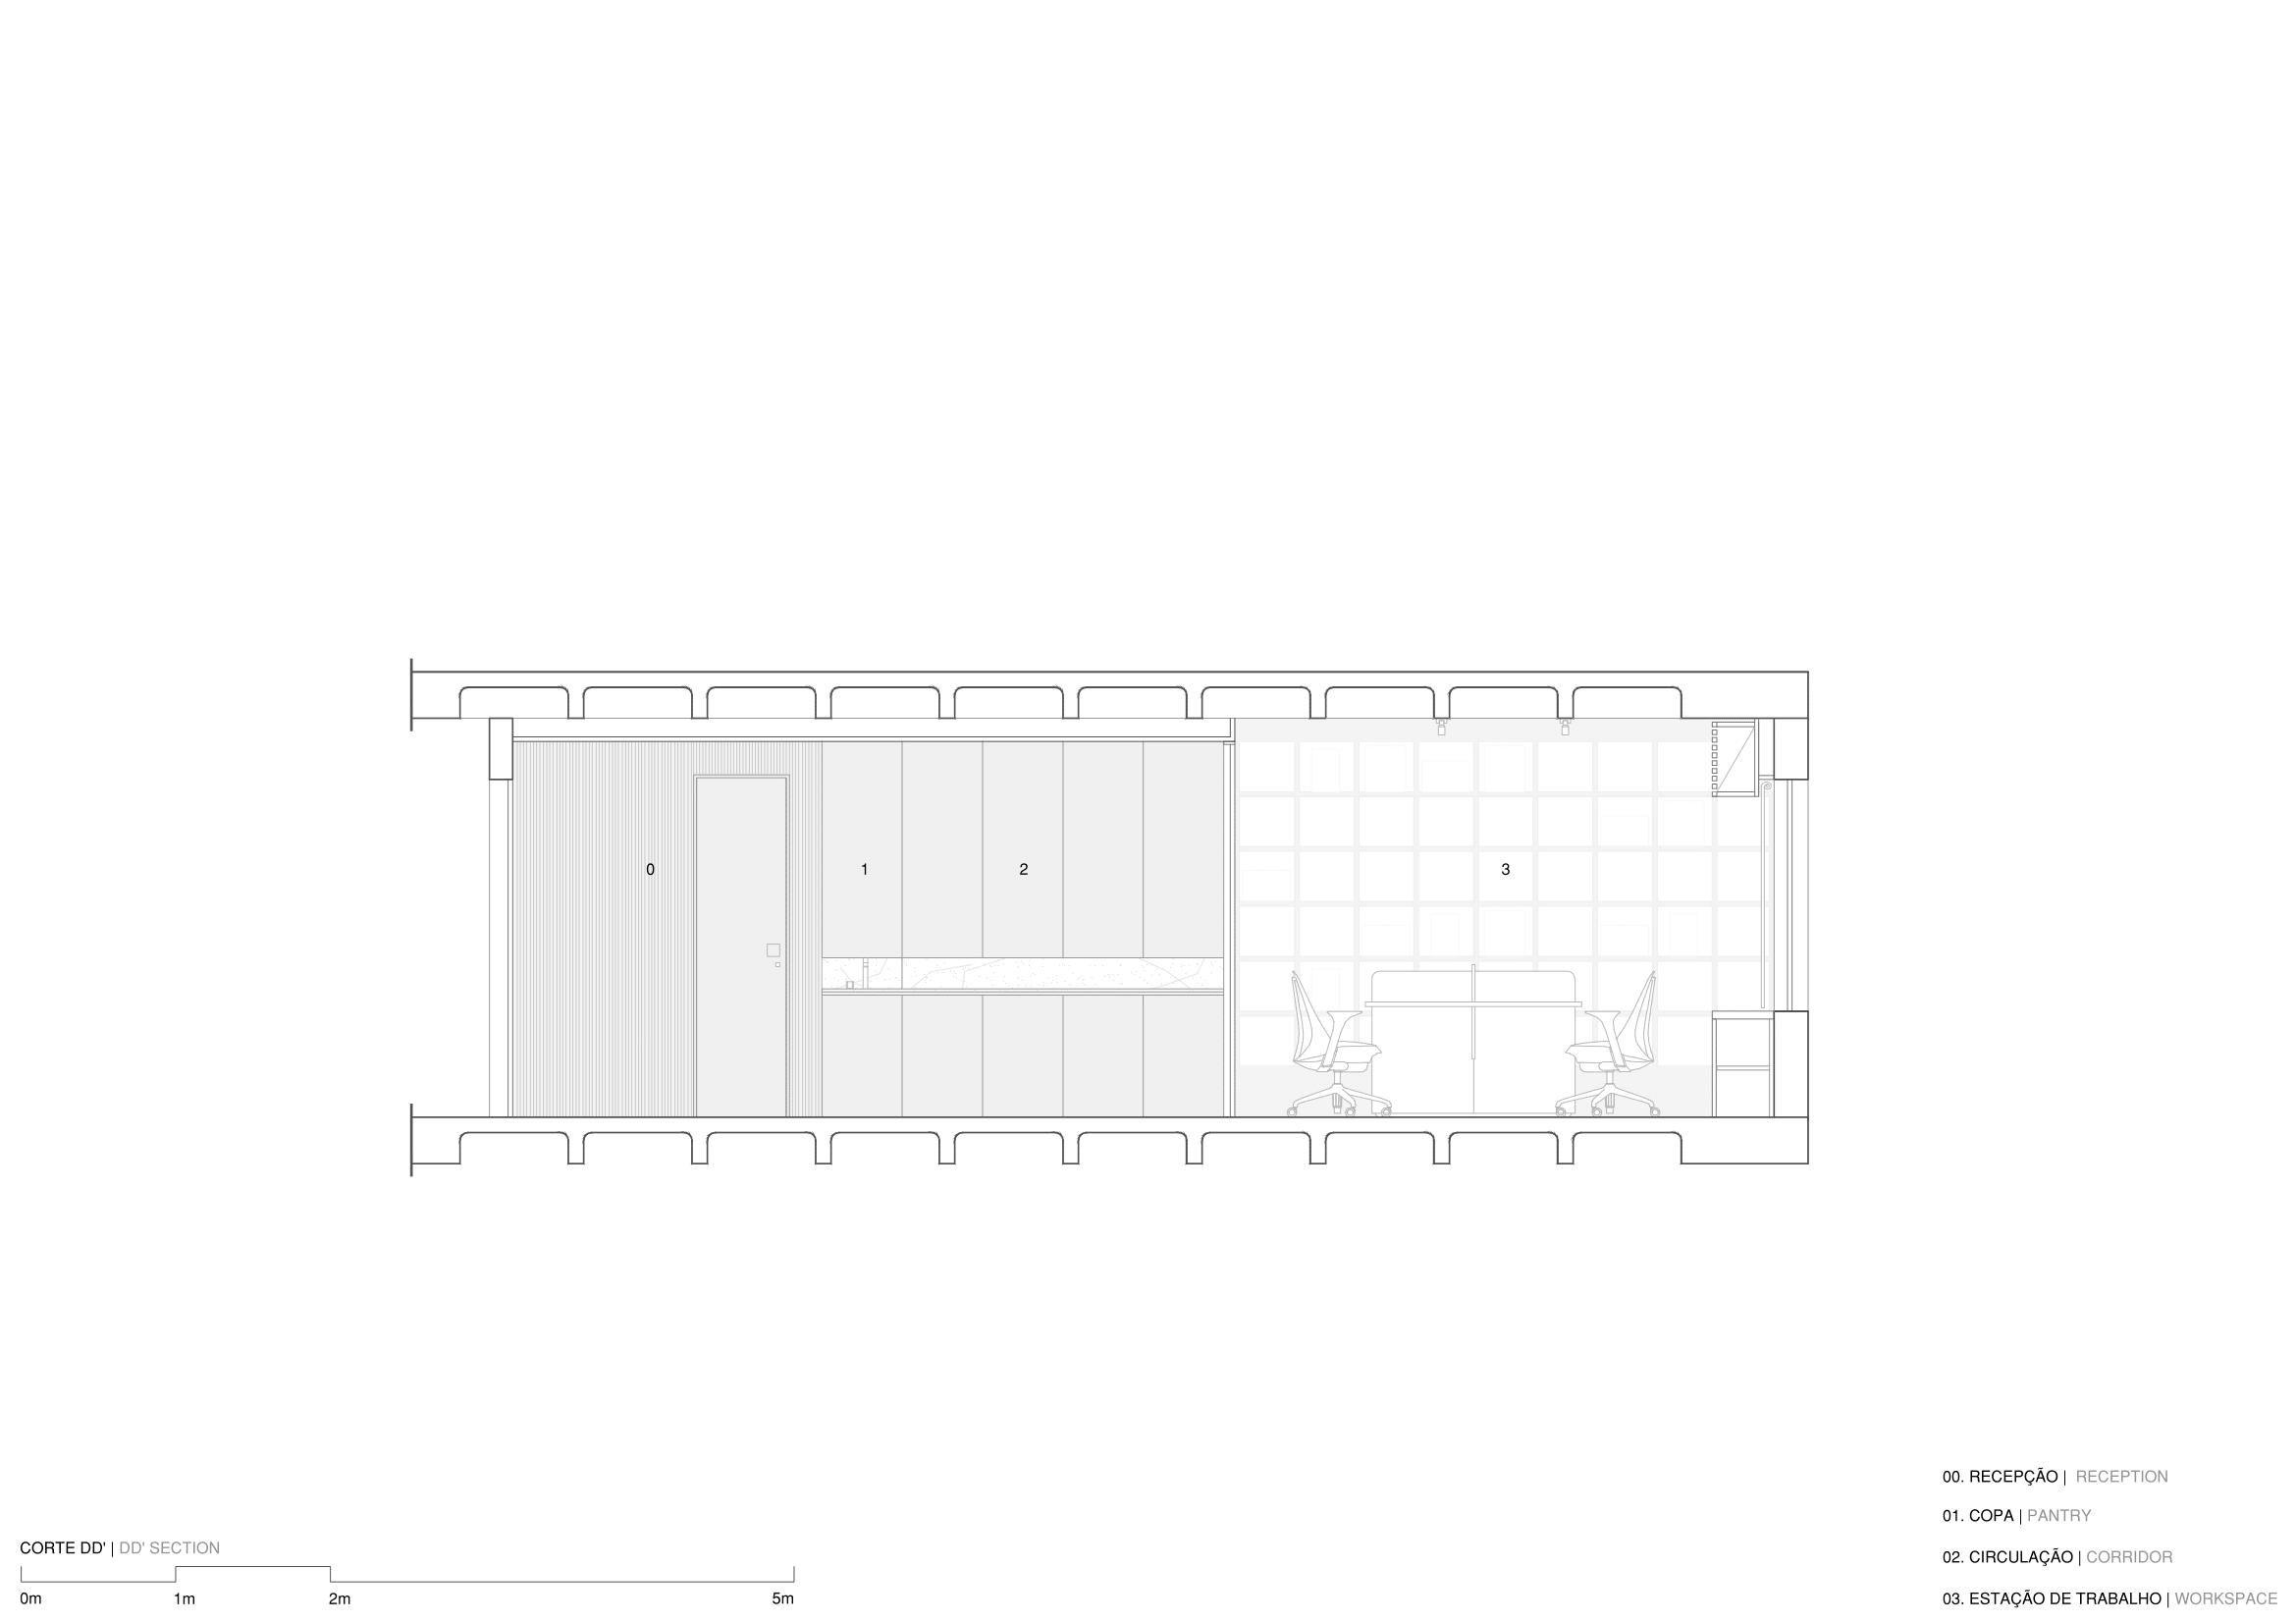 hobjeto-arquitetura-editora-zit-ap-05-cortedd